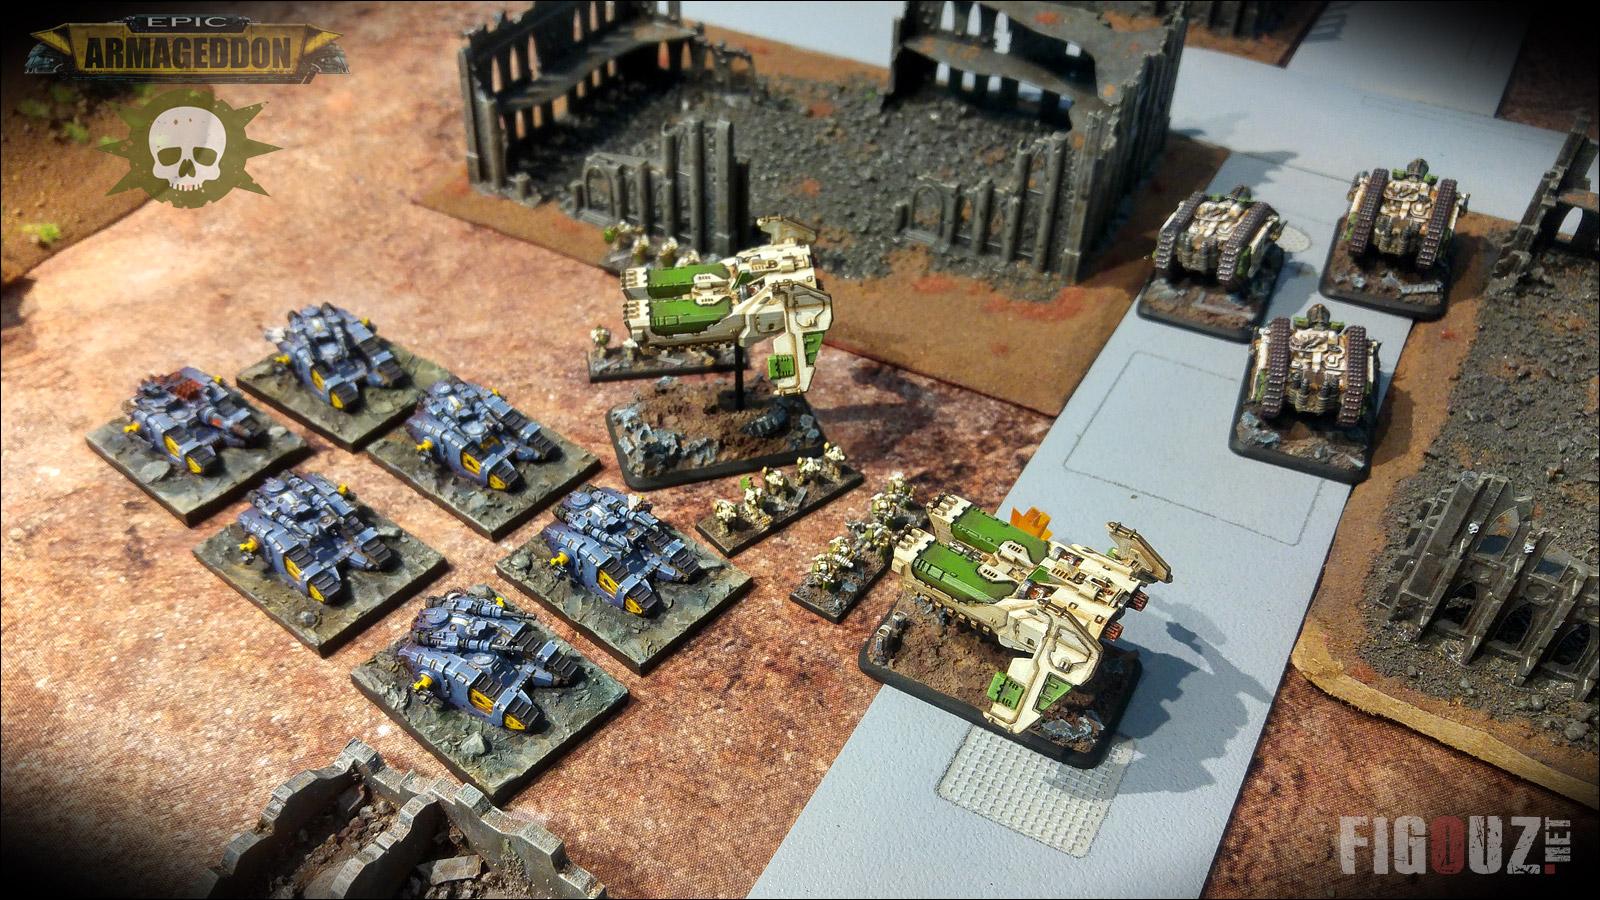 [Big Z] Death Korps, Legio Fureans, Death Guard Pré-Héresie - Page 23 Megageddon-05-2018-12